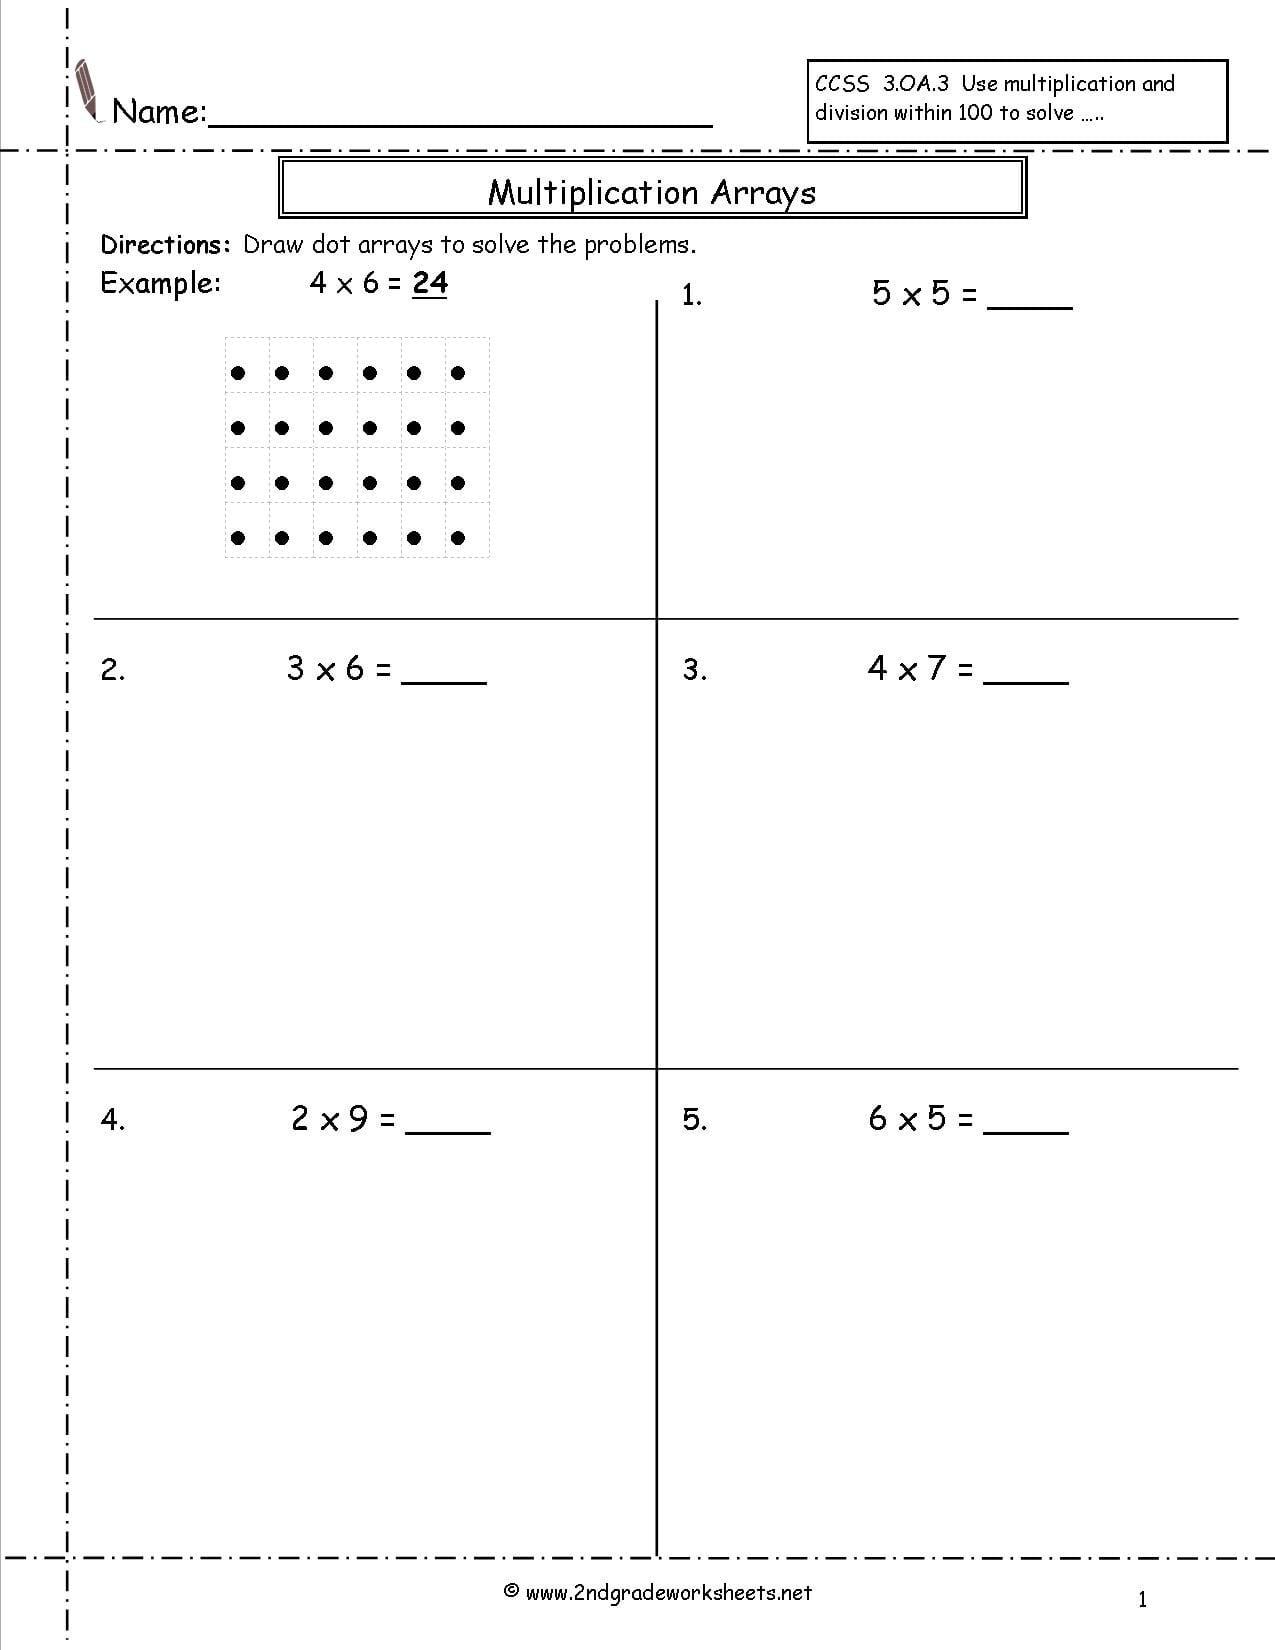 Multiplication Arrays Worksheets 4th Grade